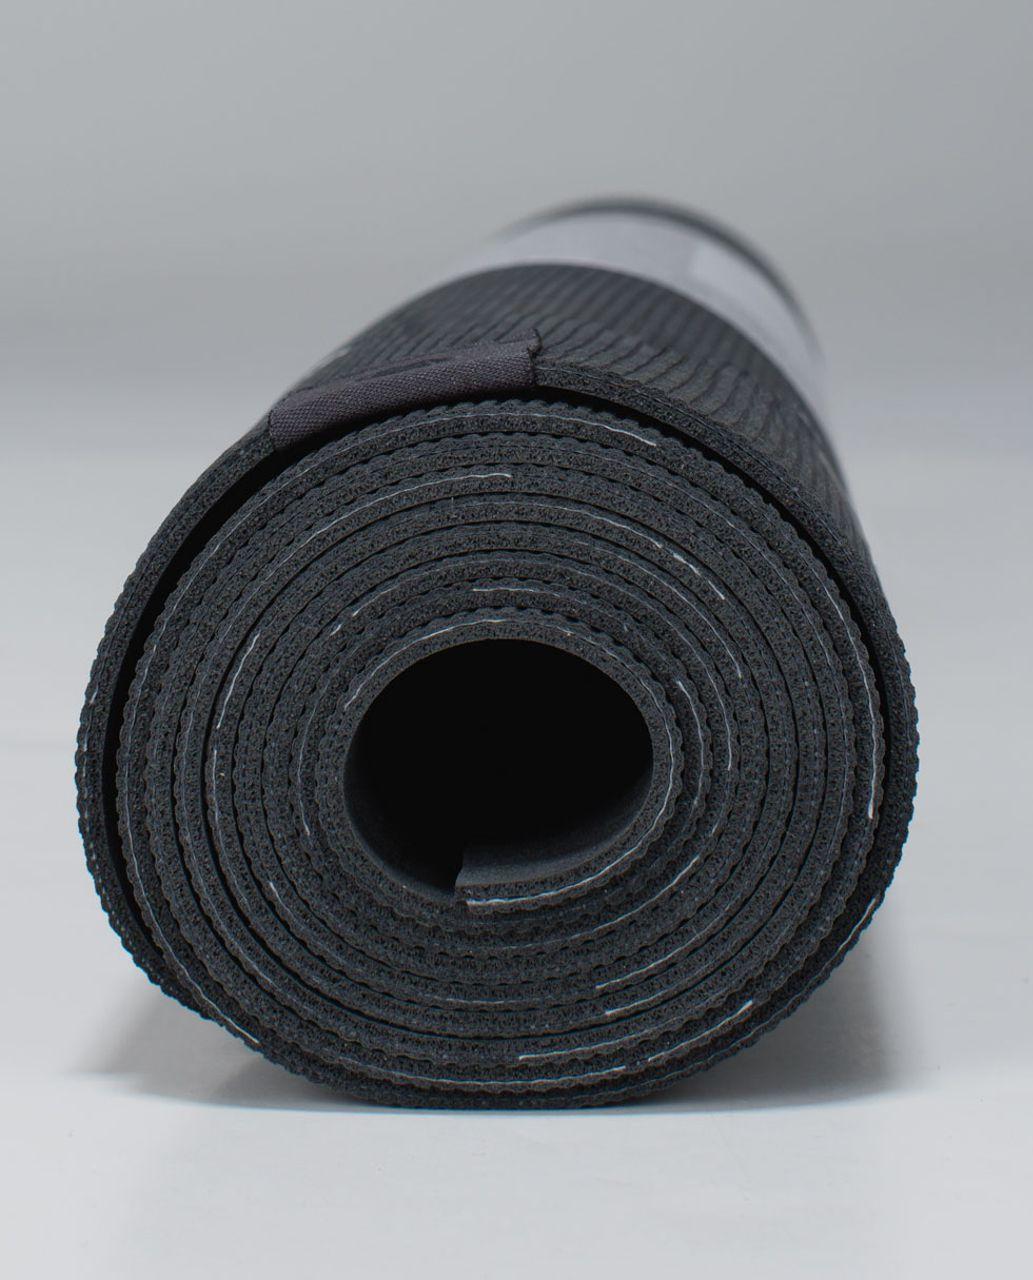 Lululemon The Pure Mat 3mm - Deep Coal